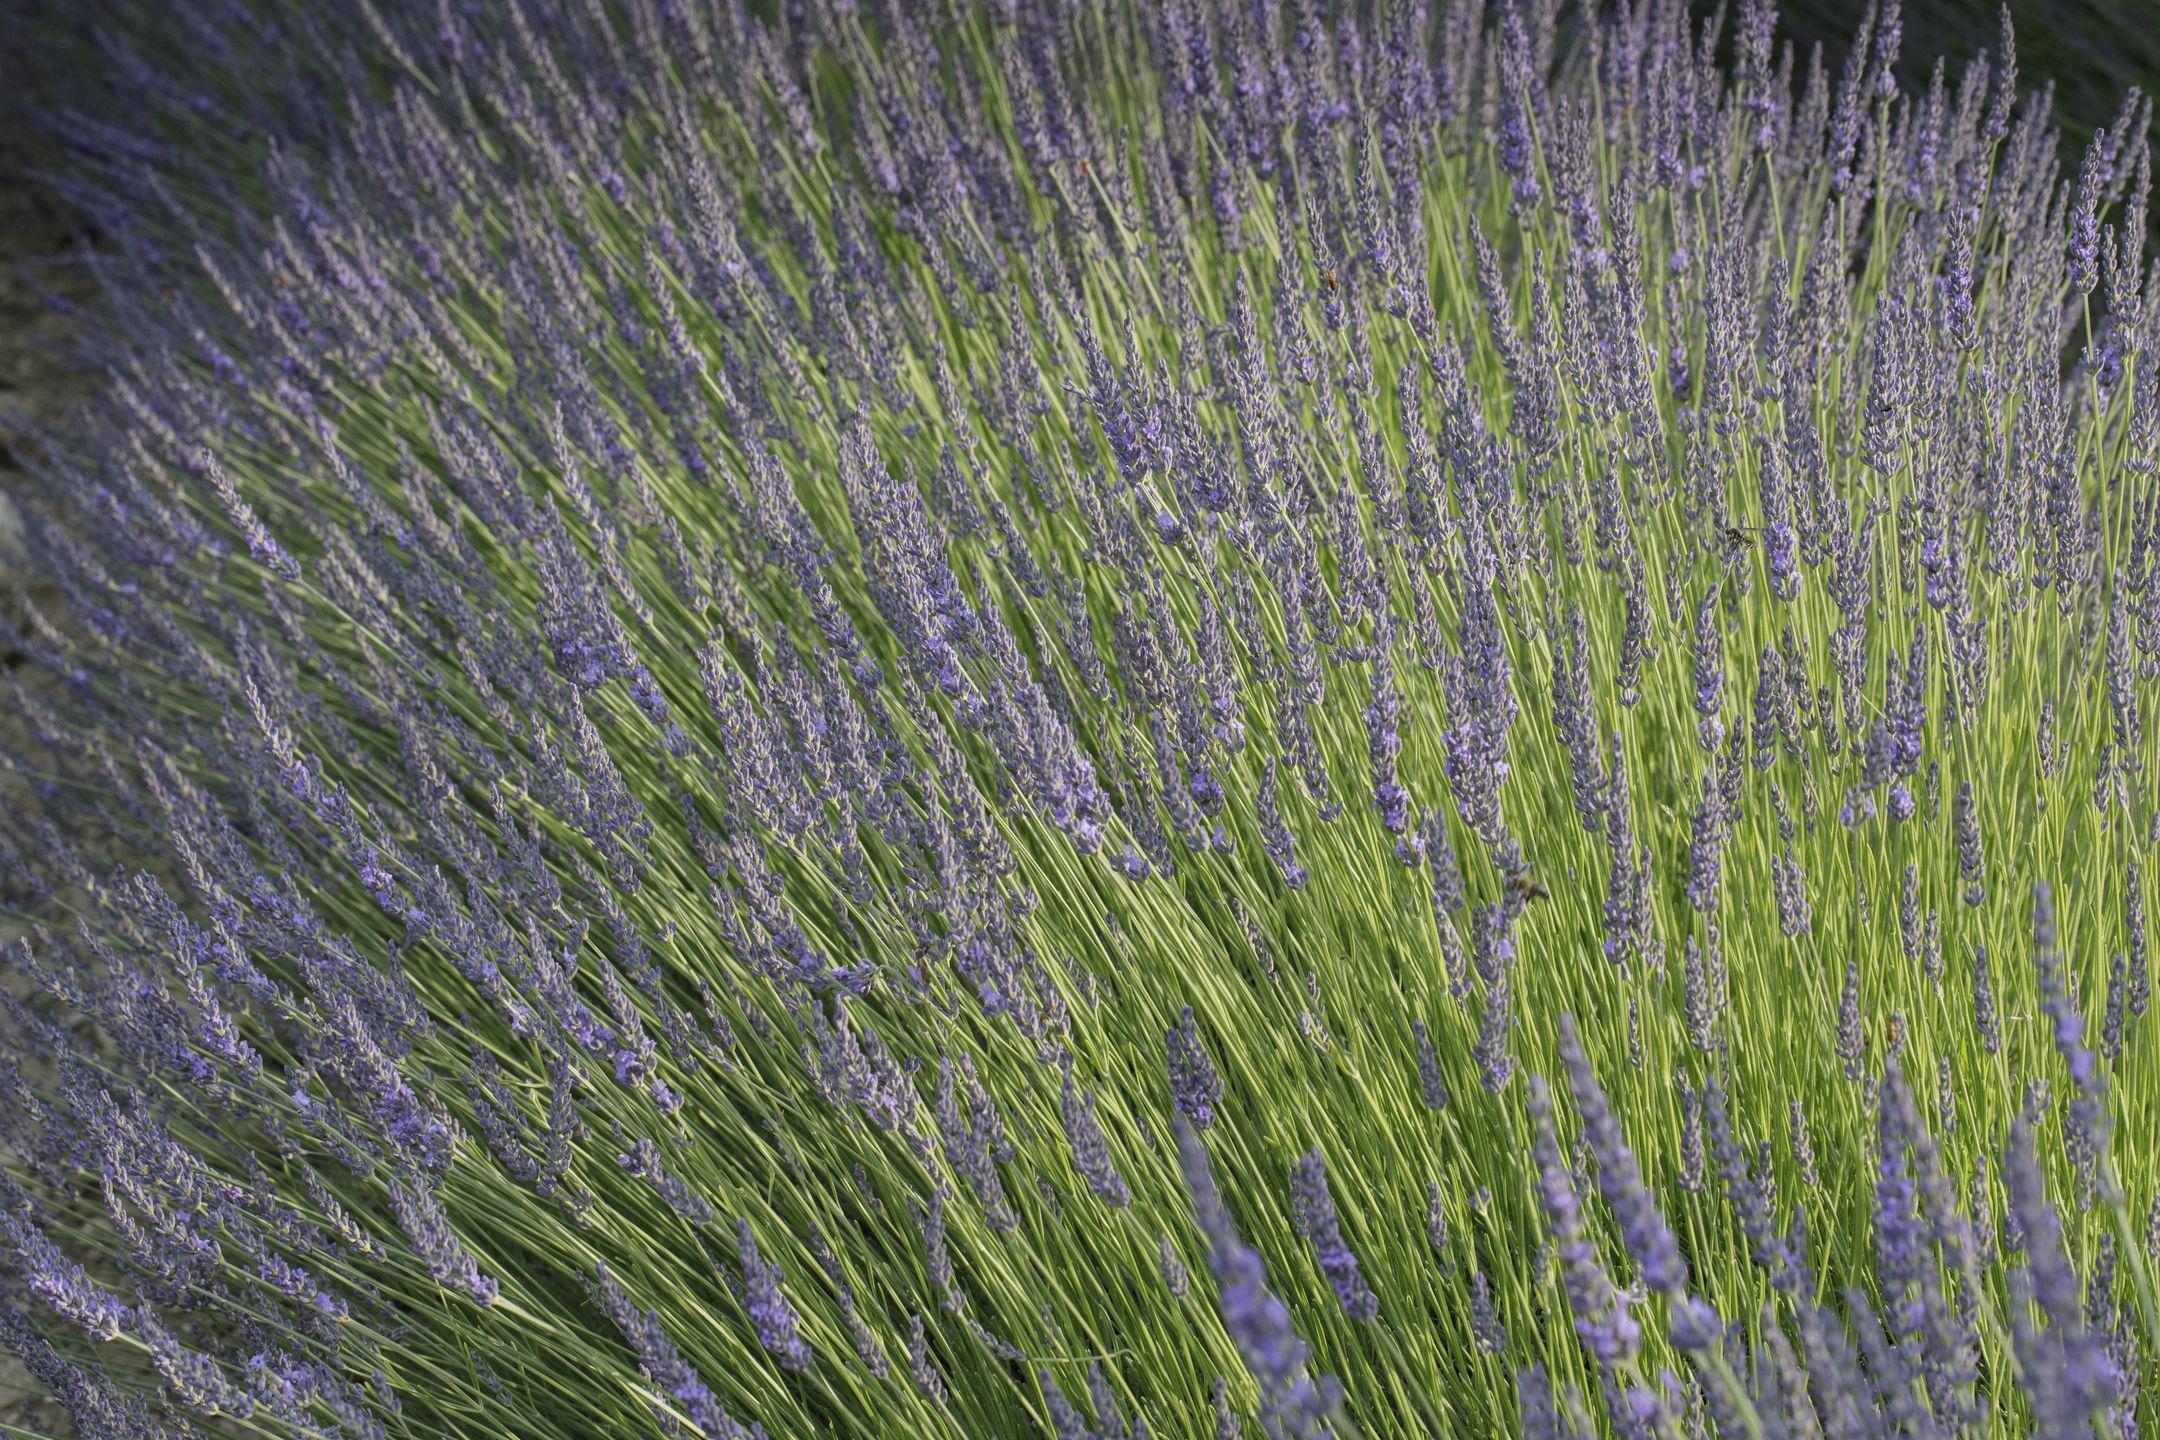 20210627-Provence-19-10-31-028